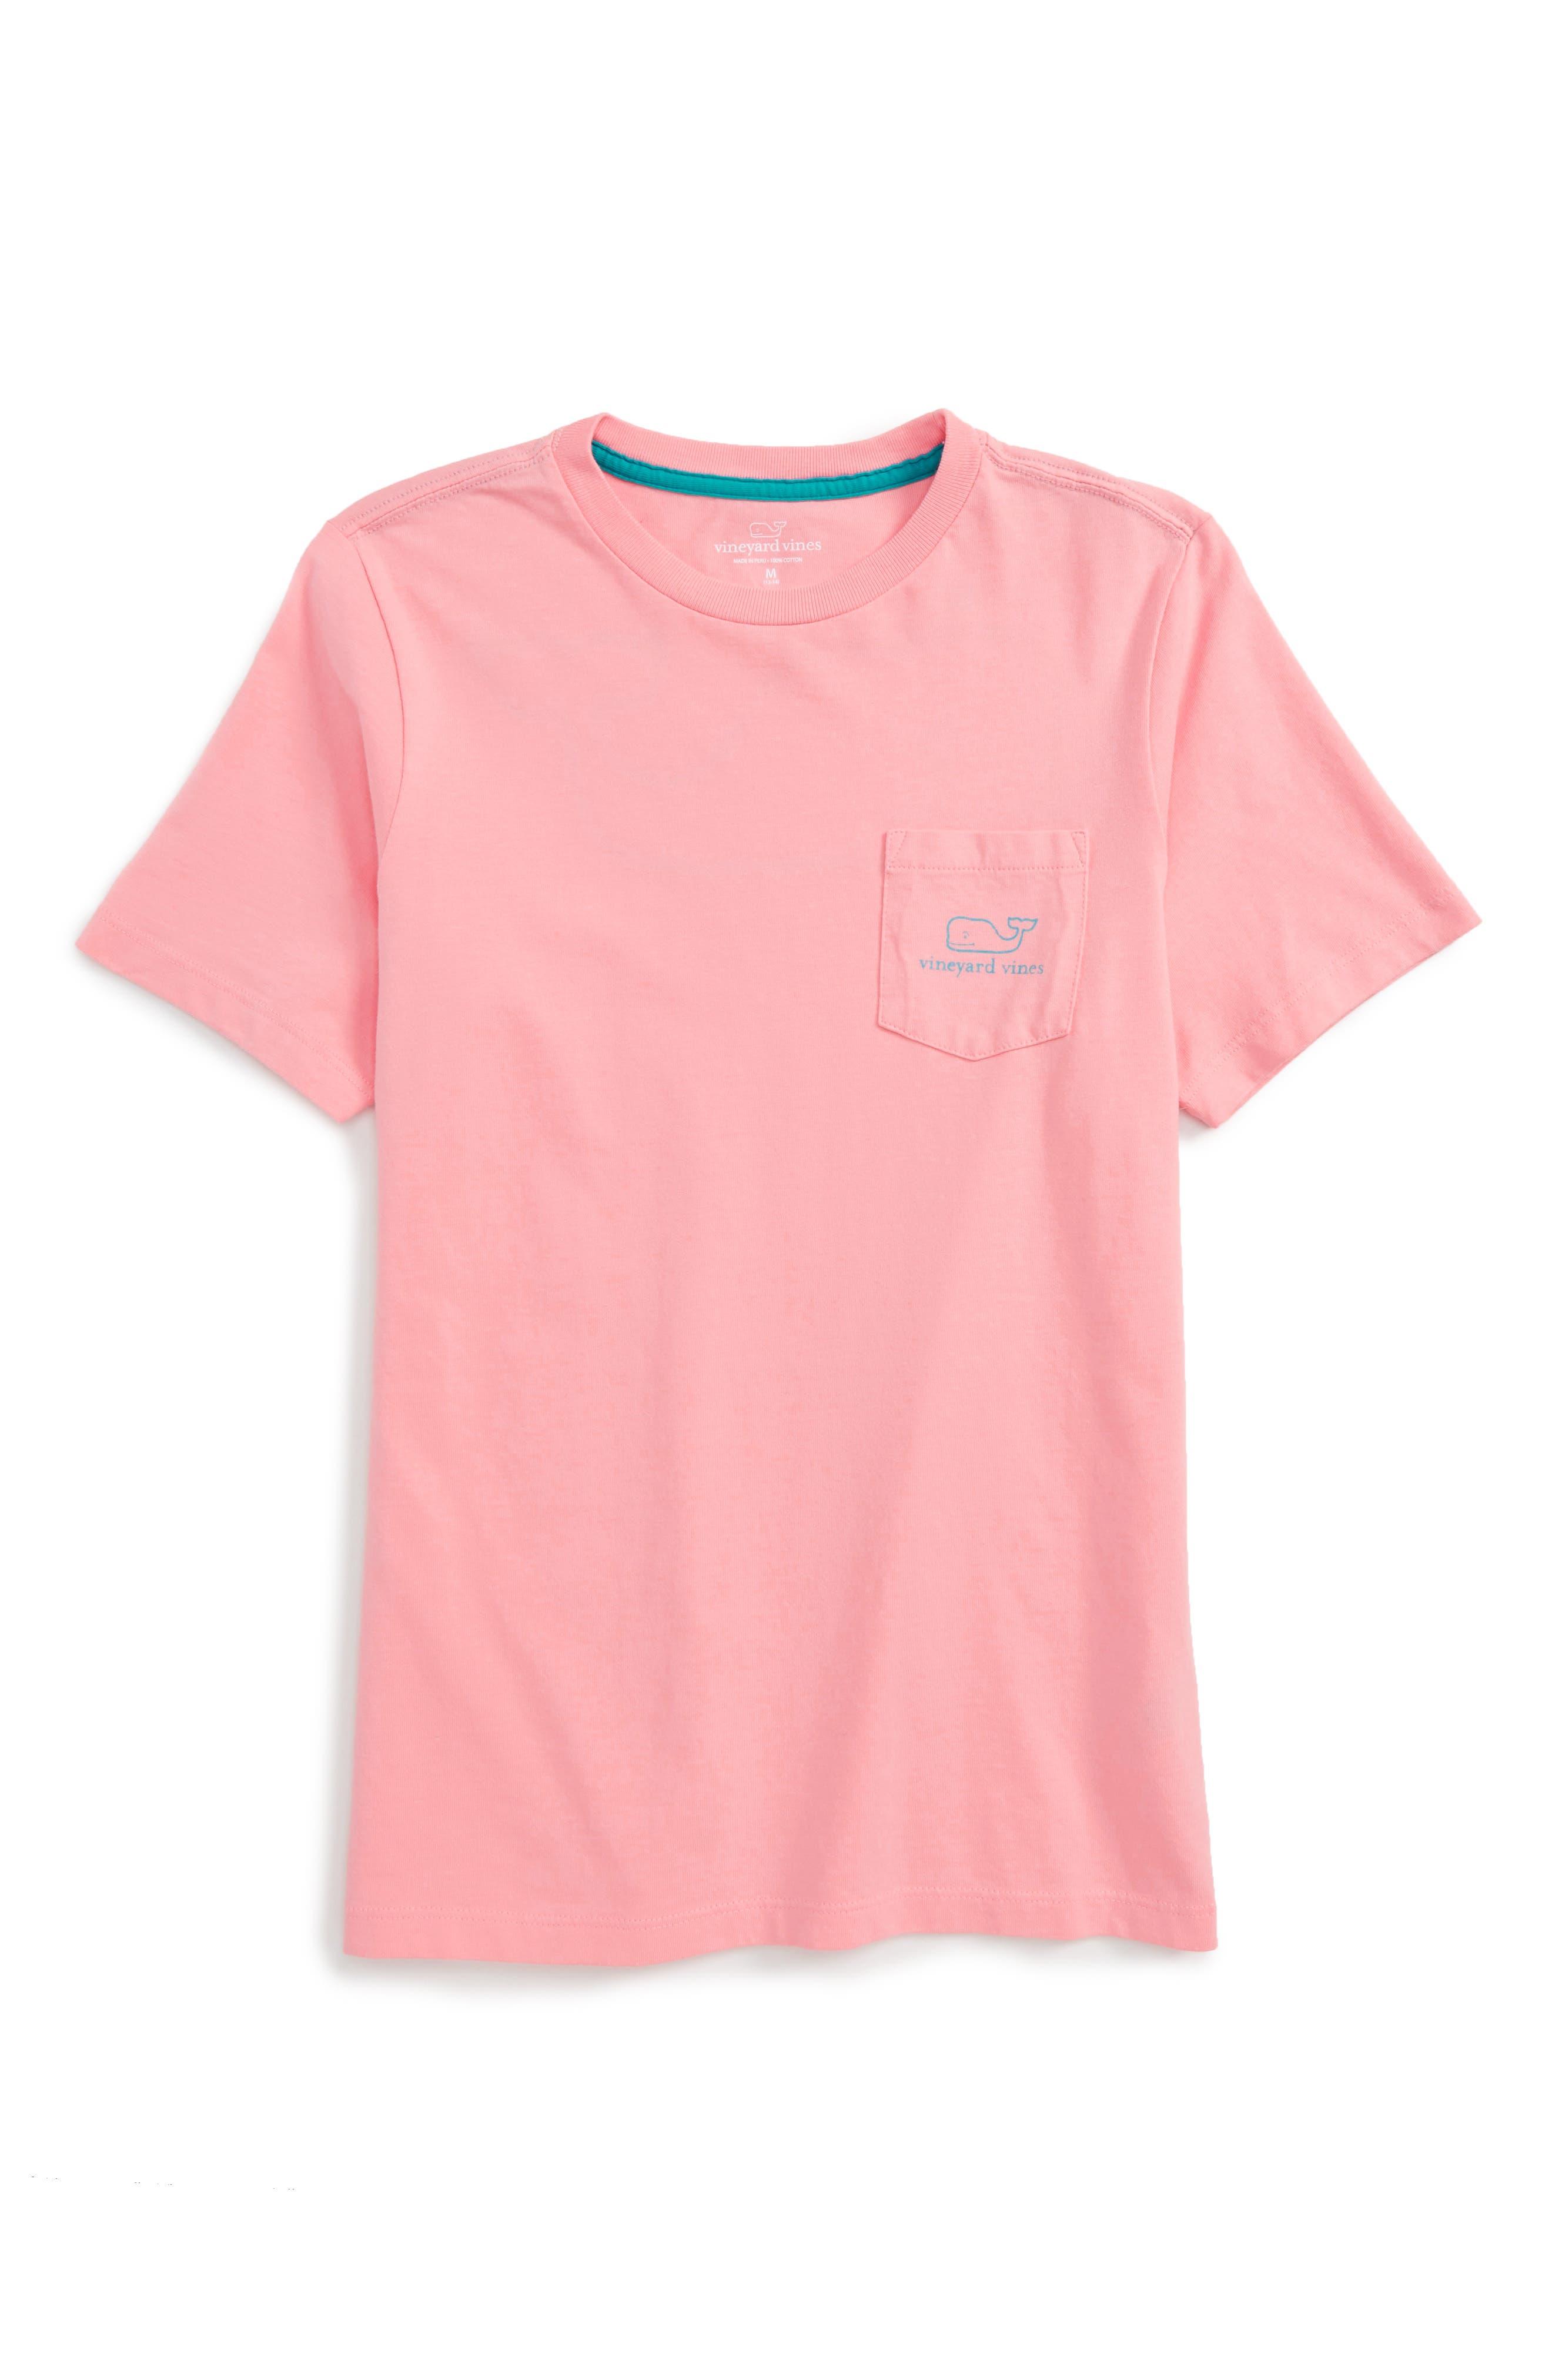 Vineyard Vines Whale T-Shirt (Big Boys)   Nordstrom